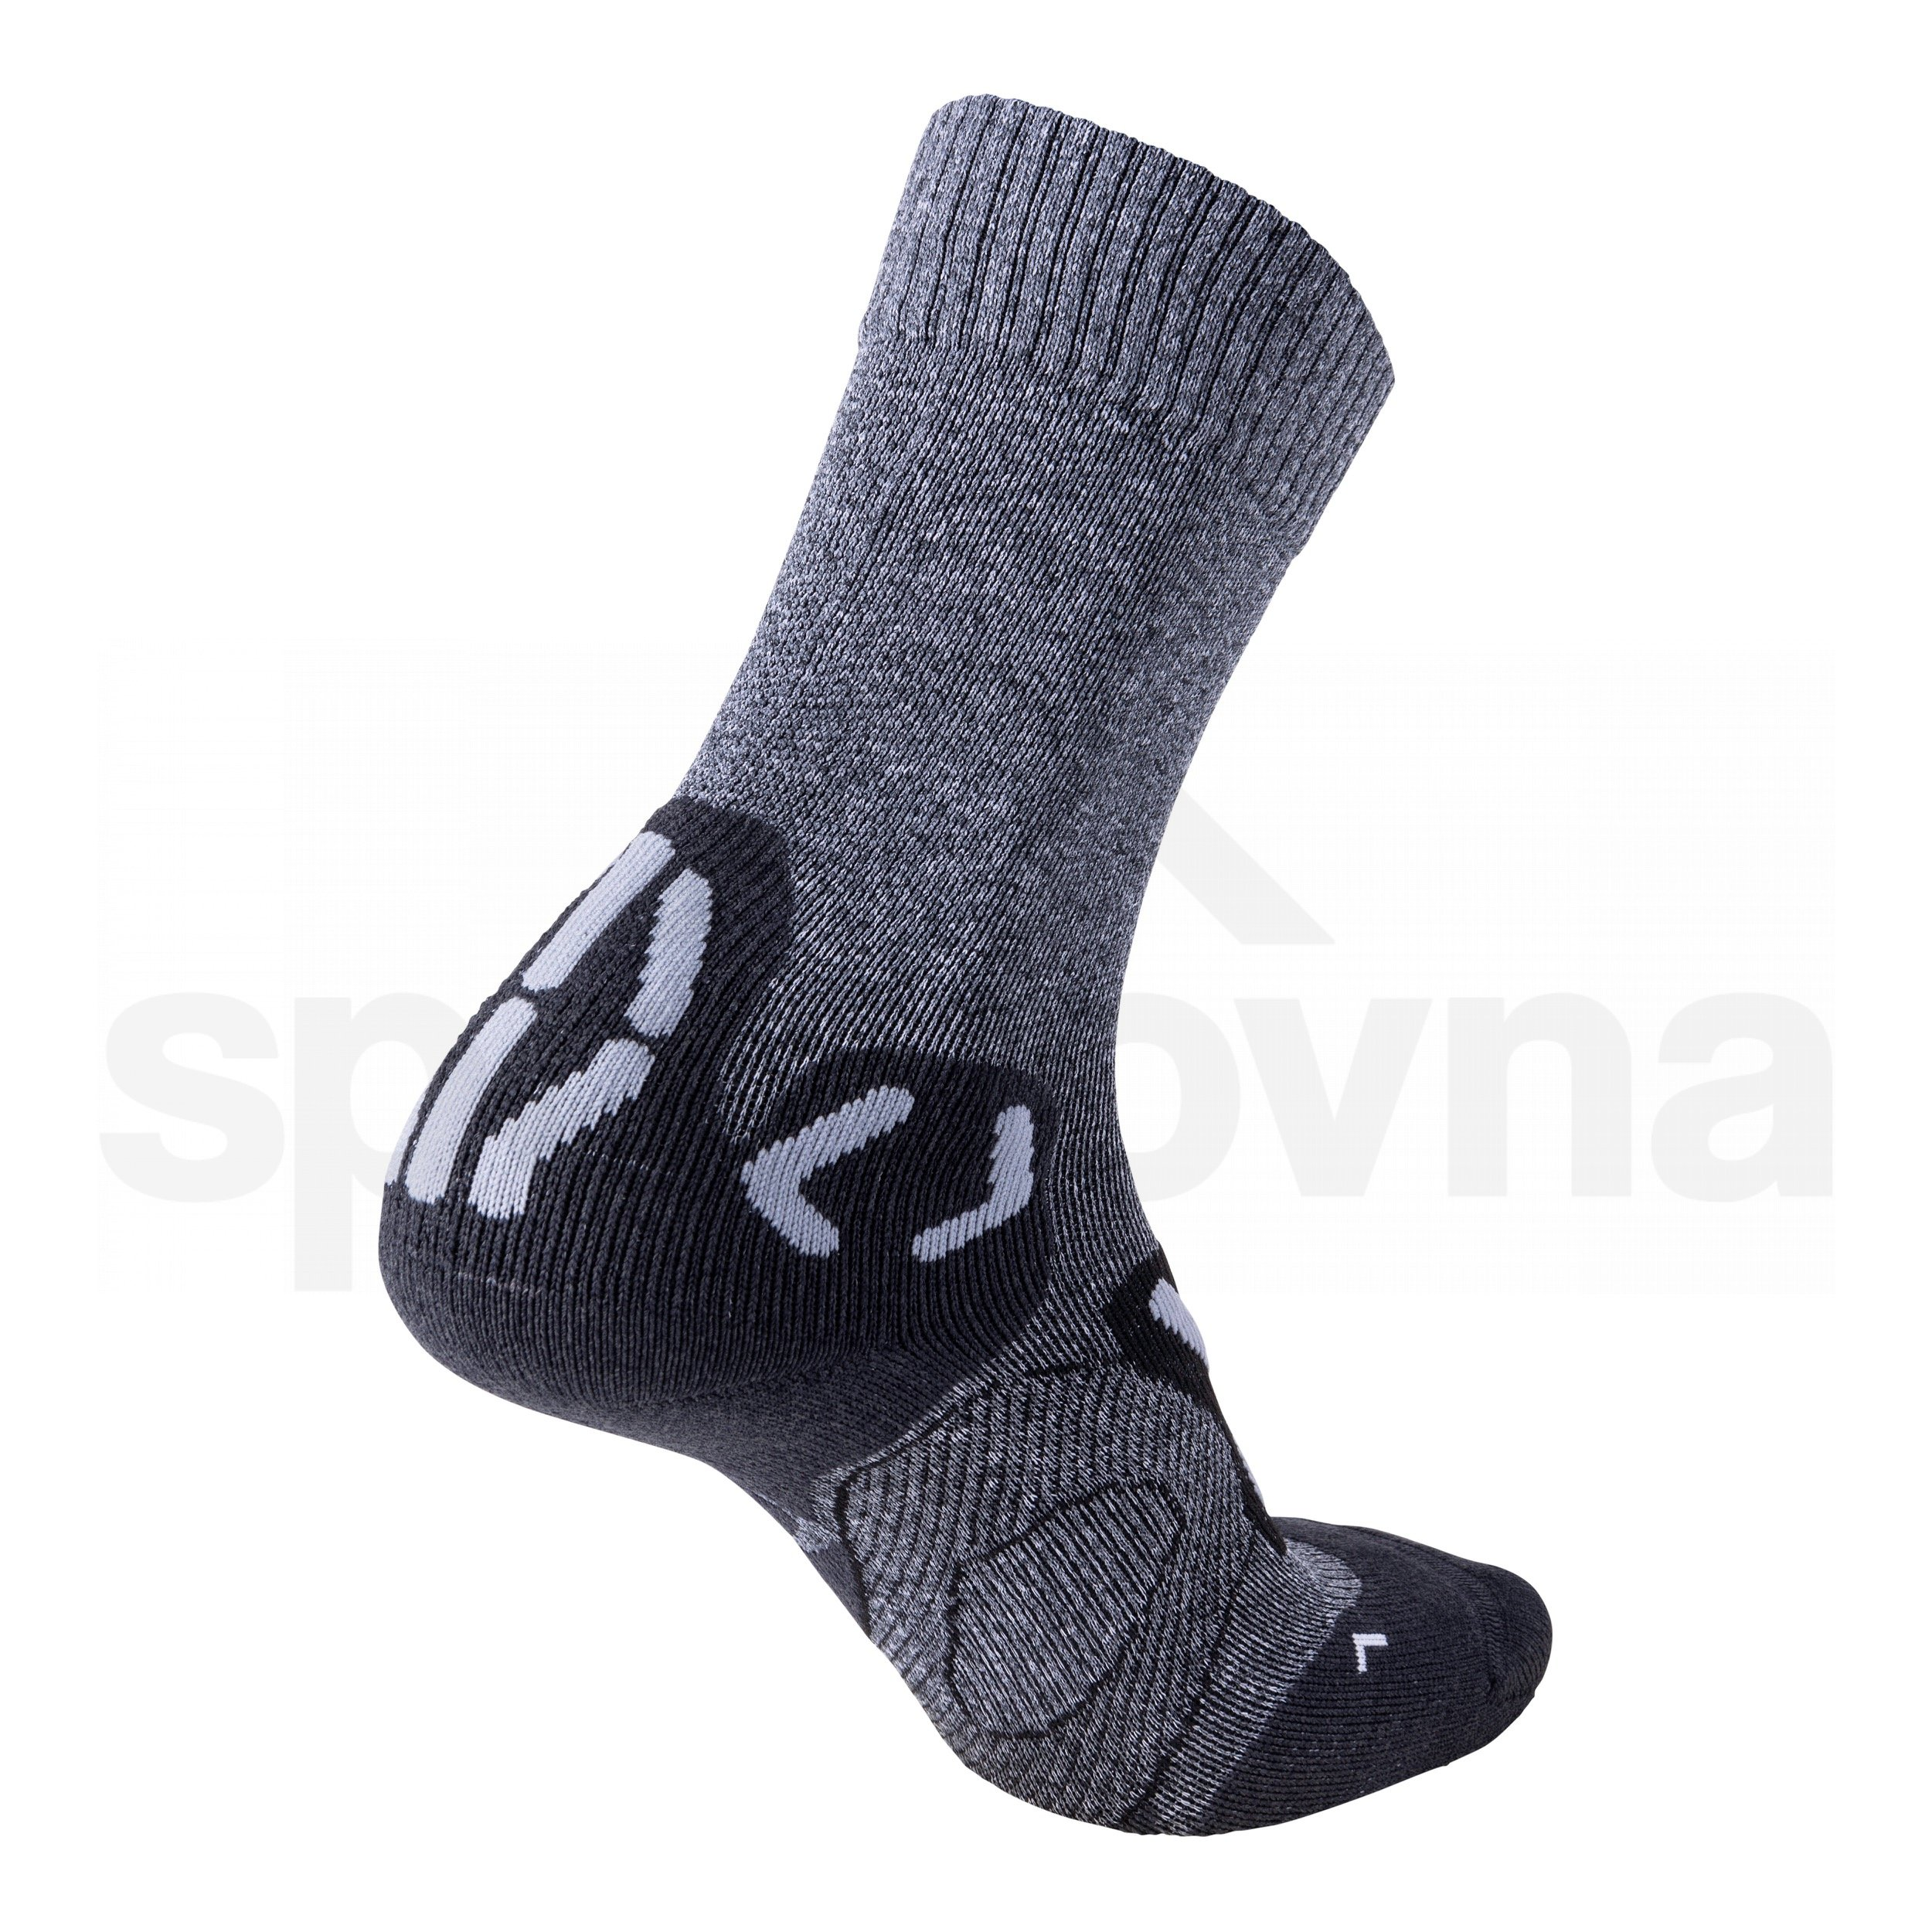 Dámské ponožky UYN TREKKING OUTDOOR EXPLORER MID- grey melange/pearl grey